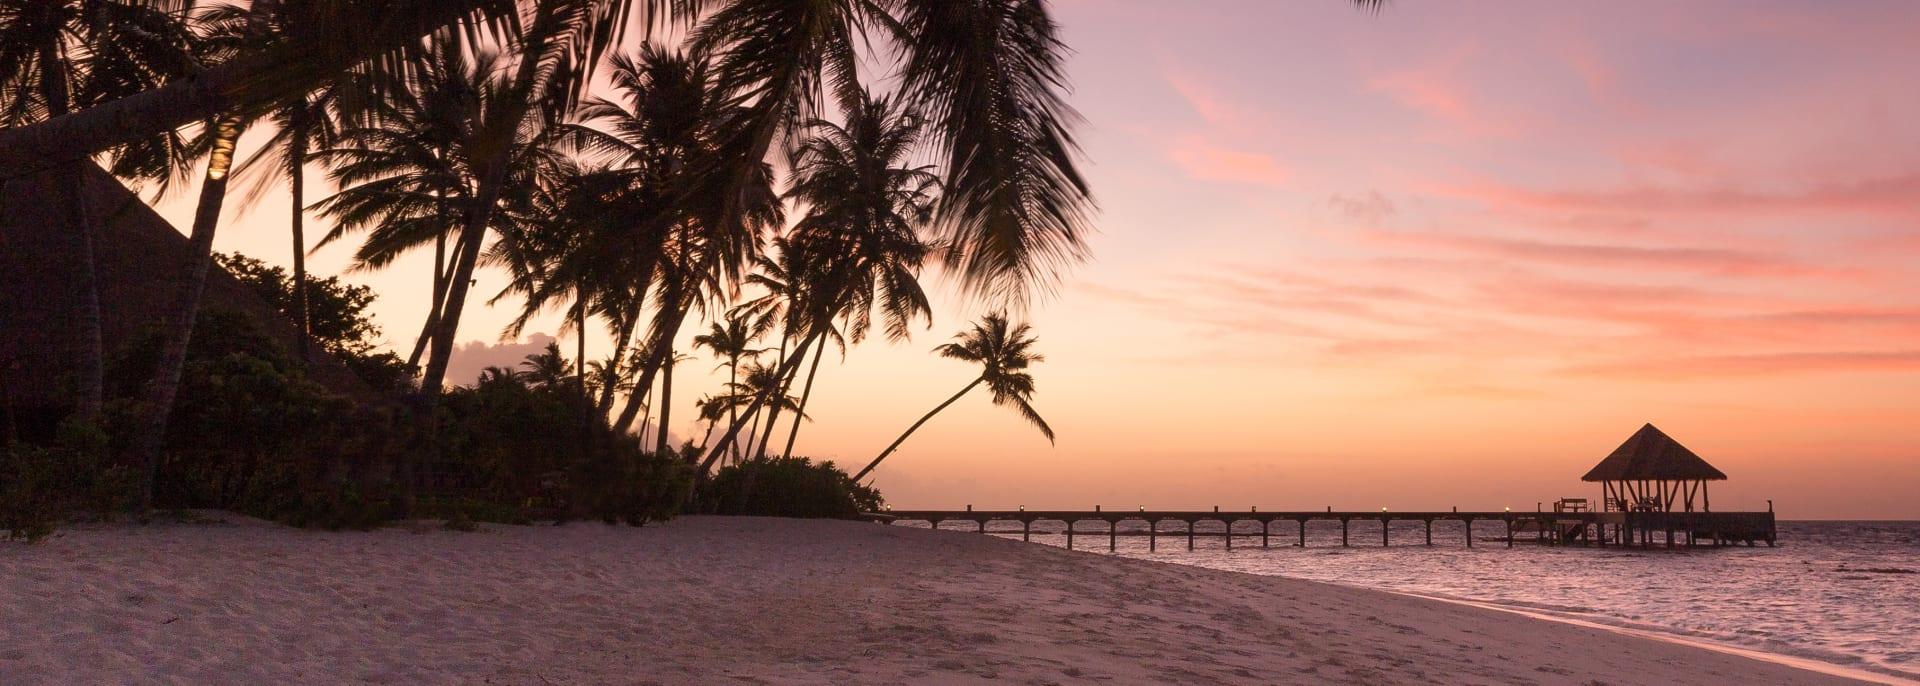 Strand gaafu, Malediven